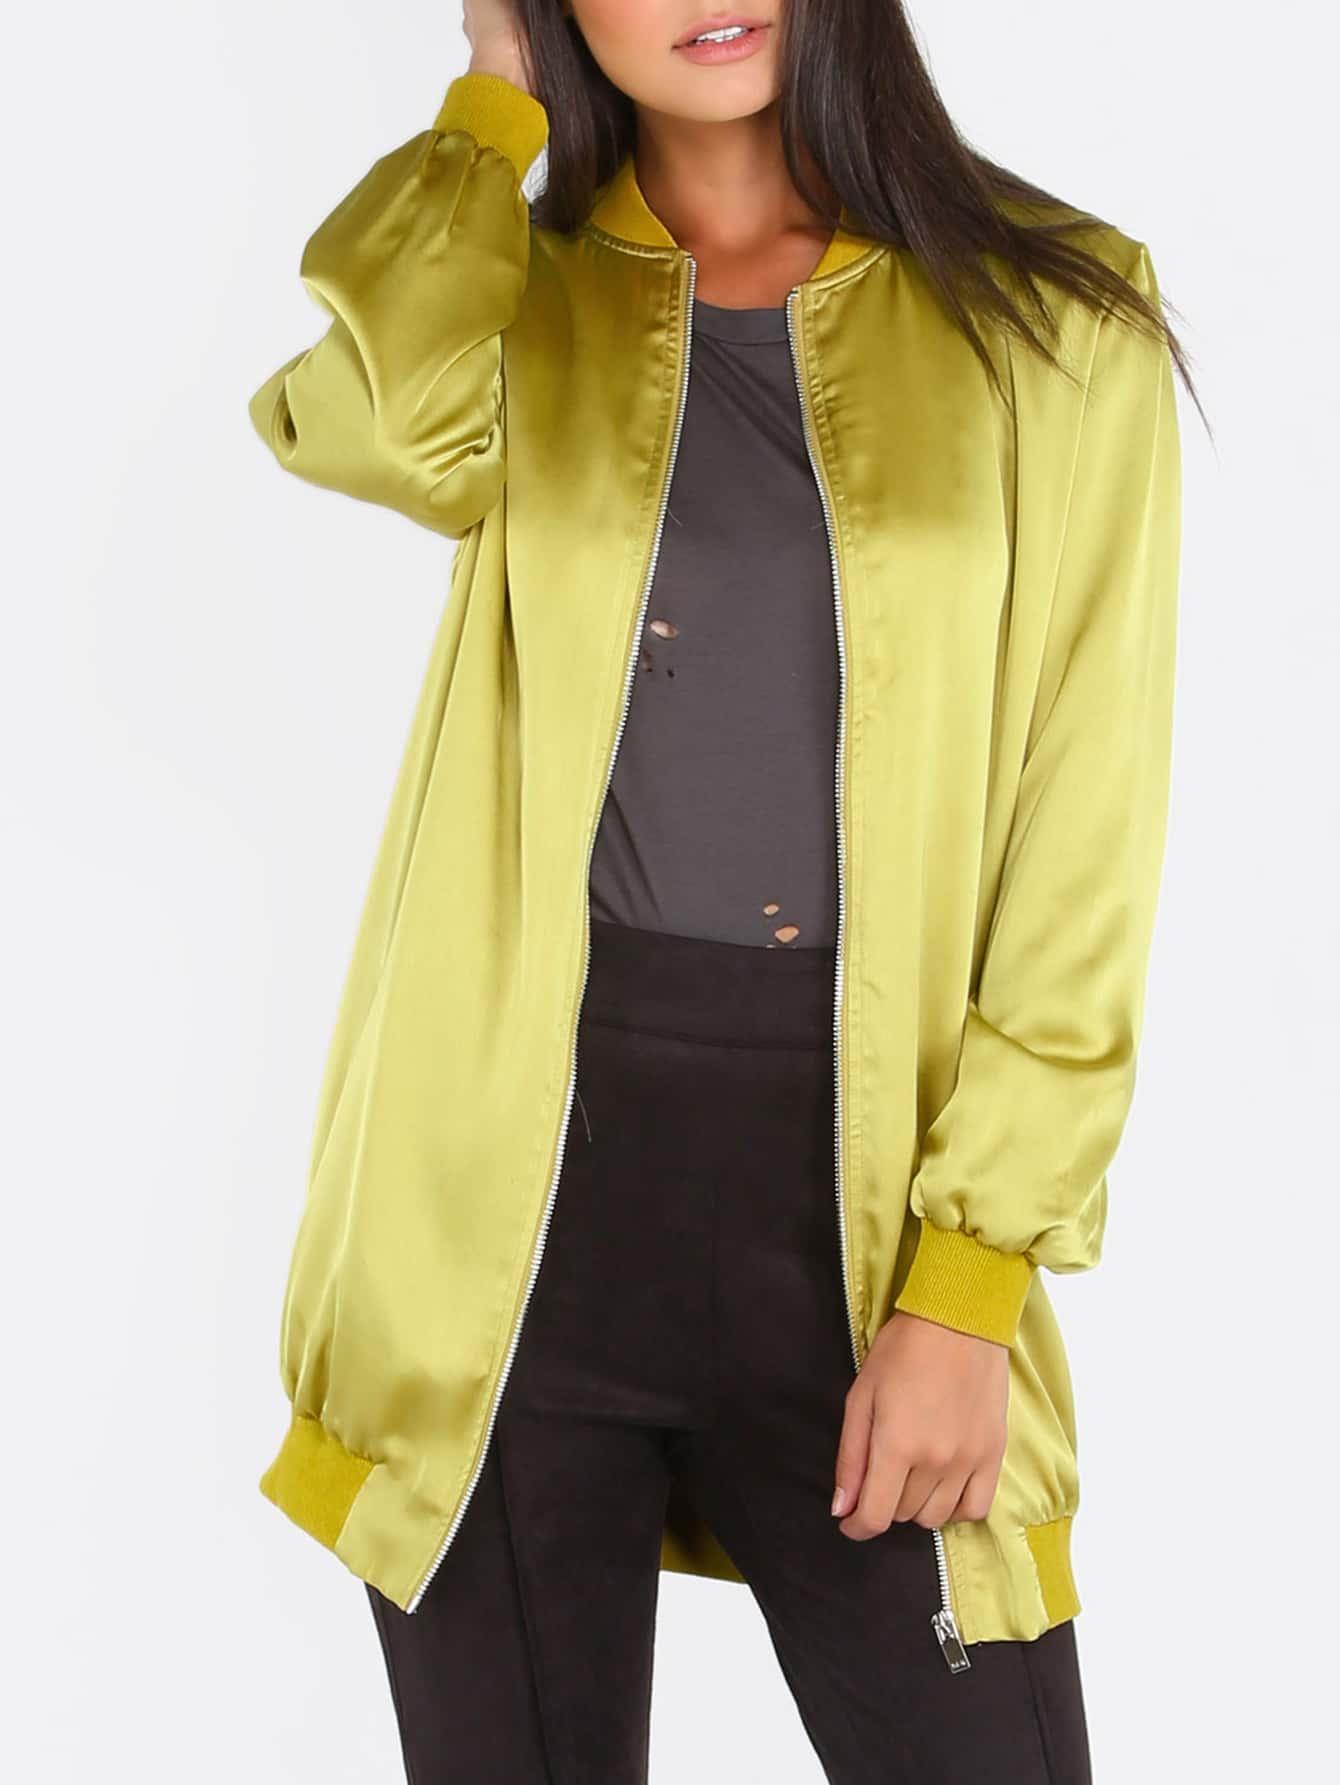 Yellow Ribbed Trim Zip Up Long Satin Bomber Jacket jacketmmc160823707